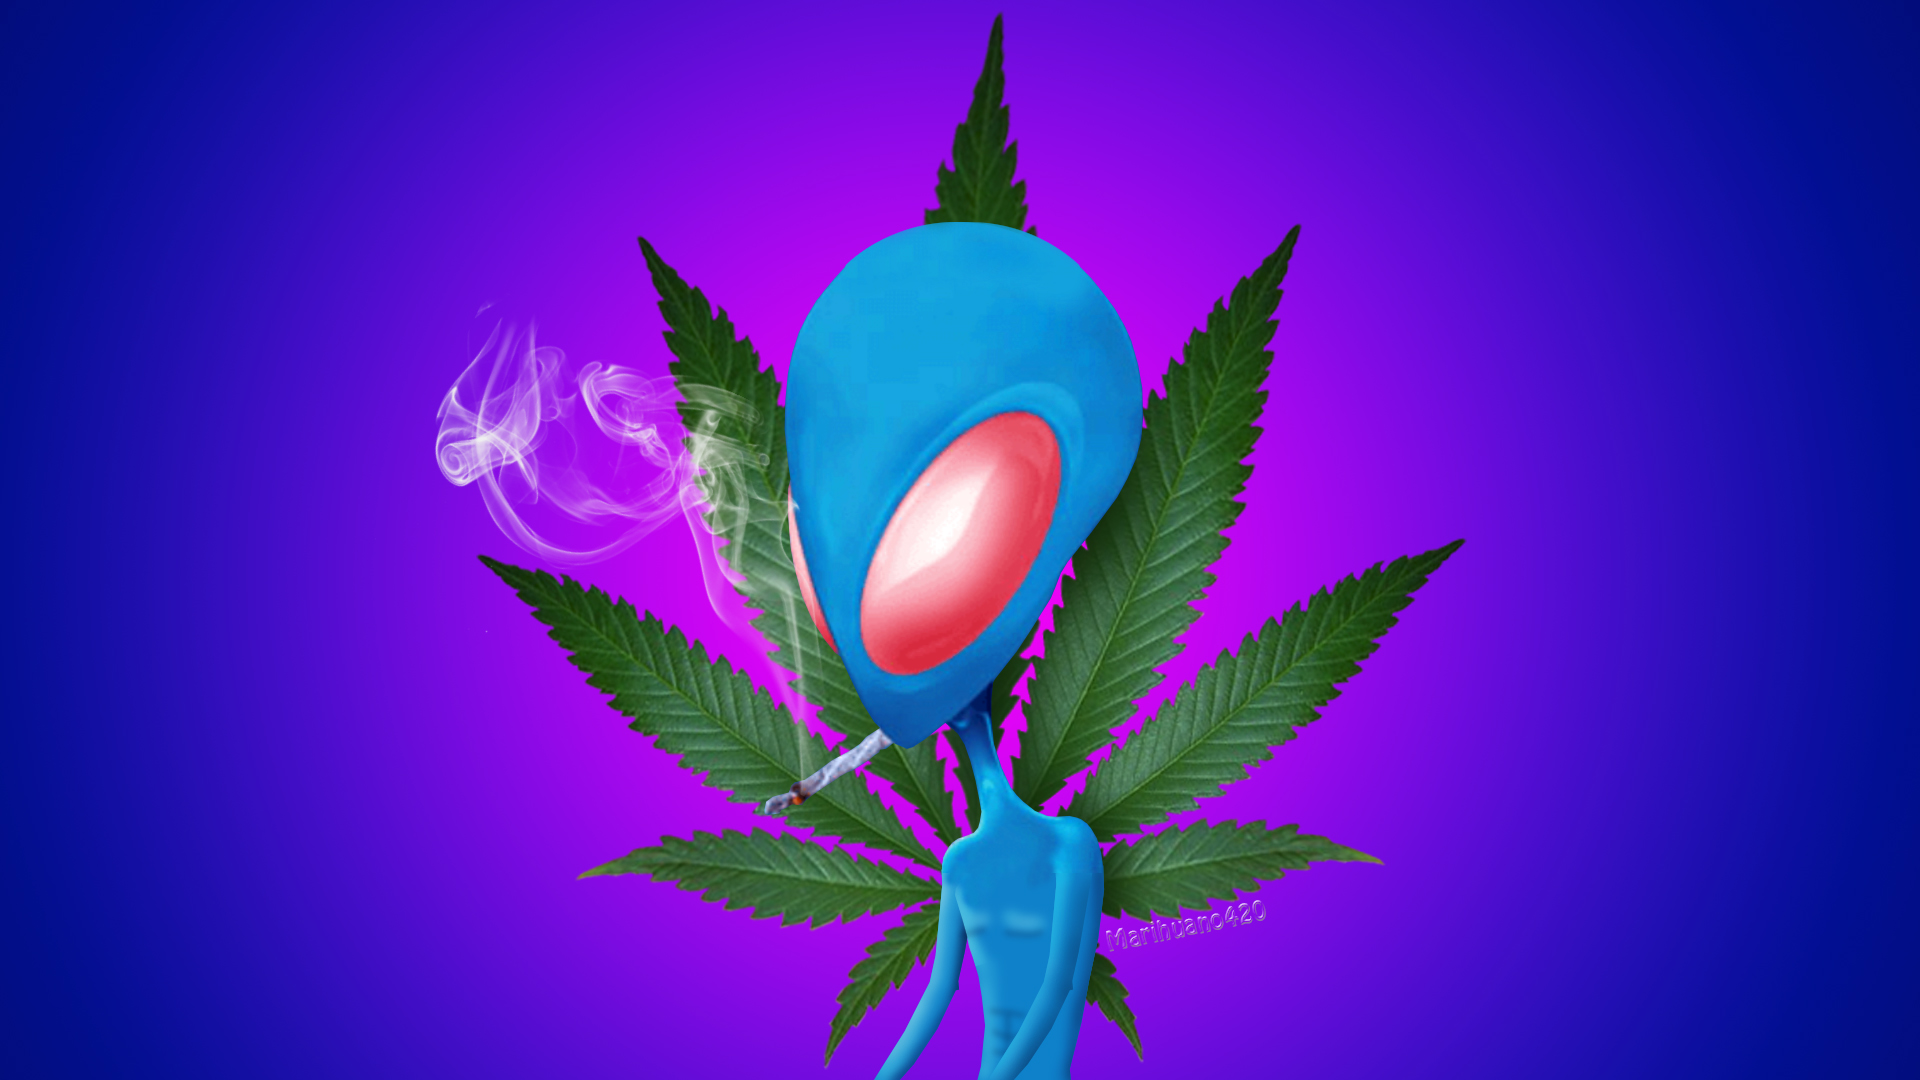 Alien Stoner By Marihuano420